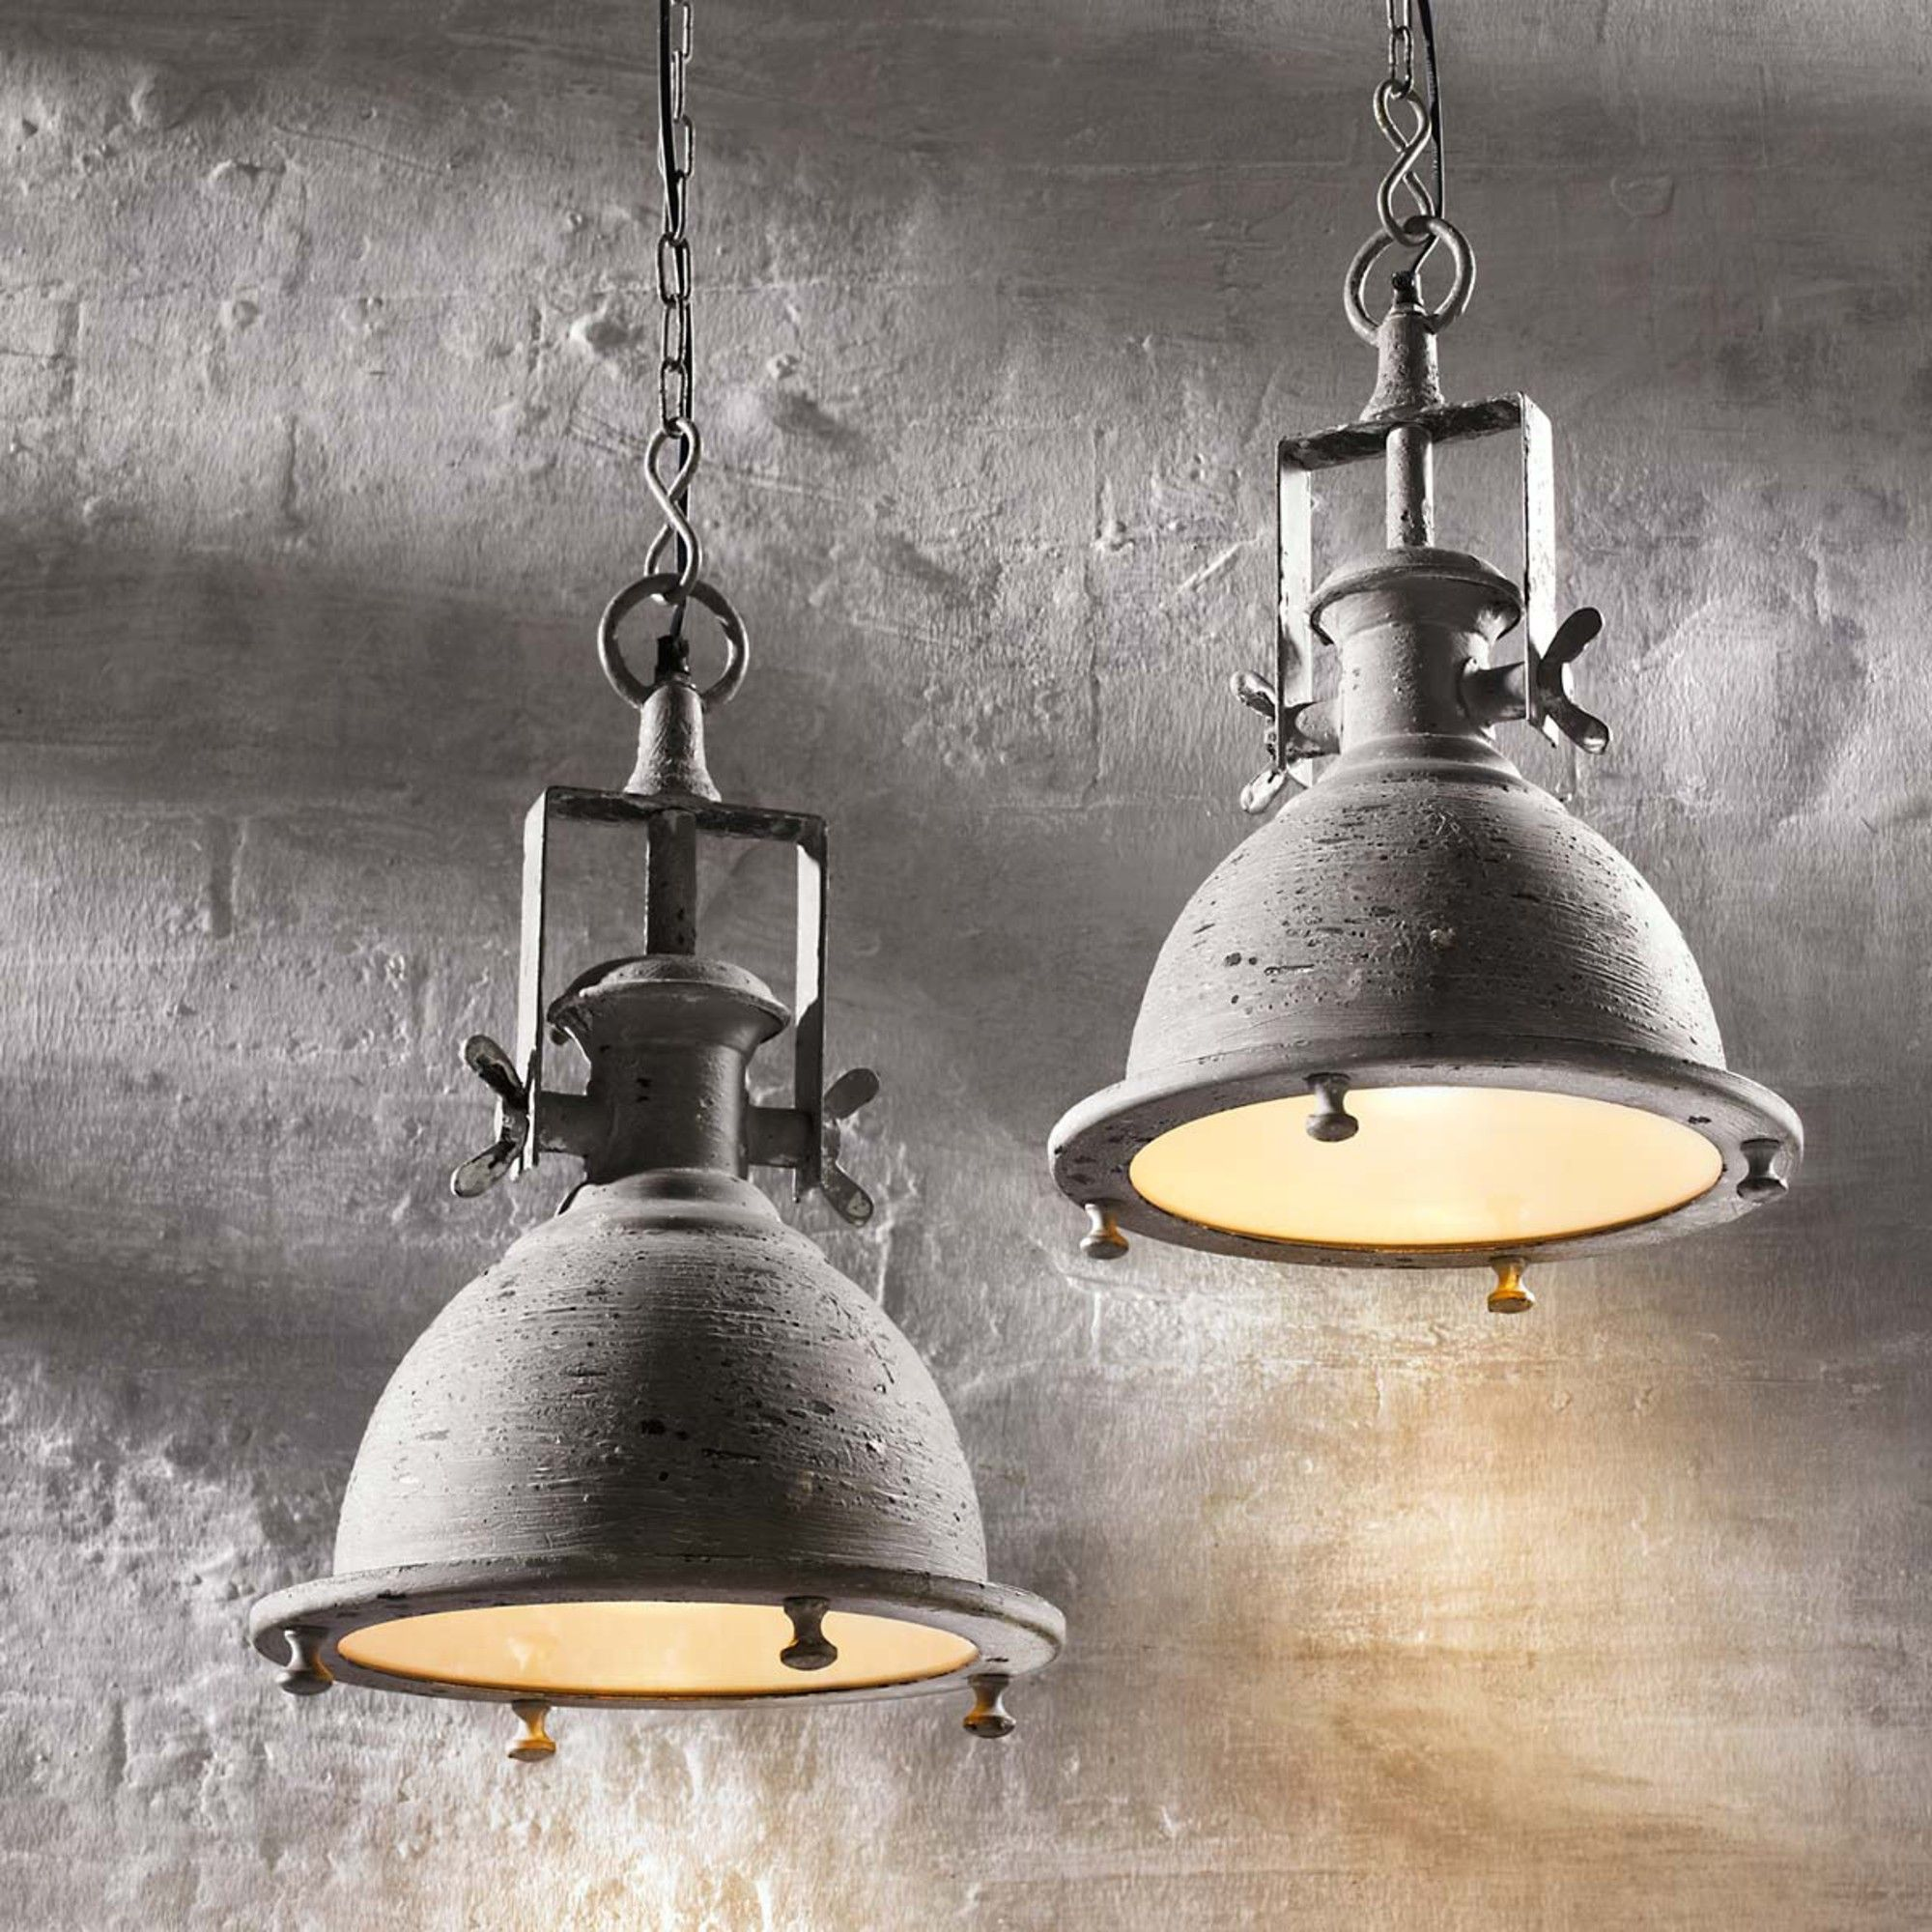 Wohnzimmer lampen rustikal  Industrie Lampe, Vintage Lampe,Pendelleuchte Antik | Lamp ...